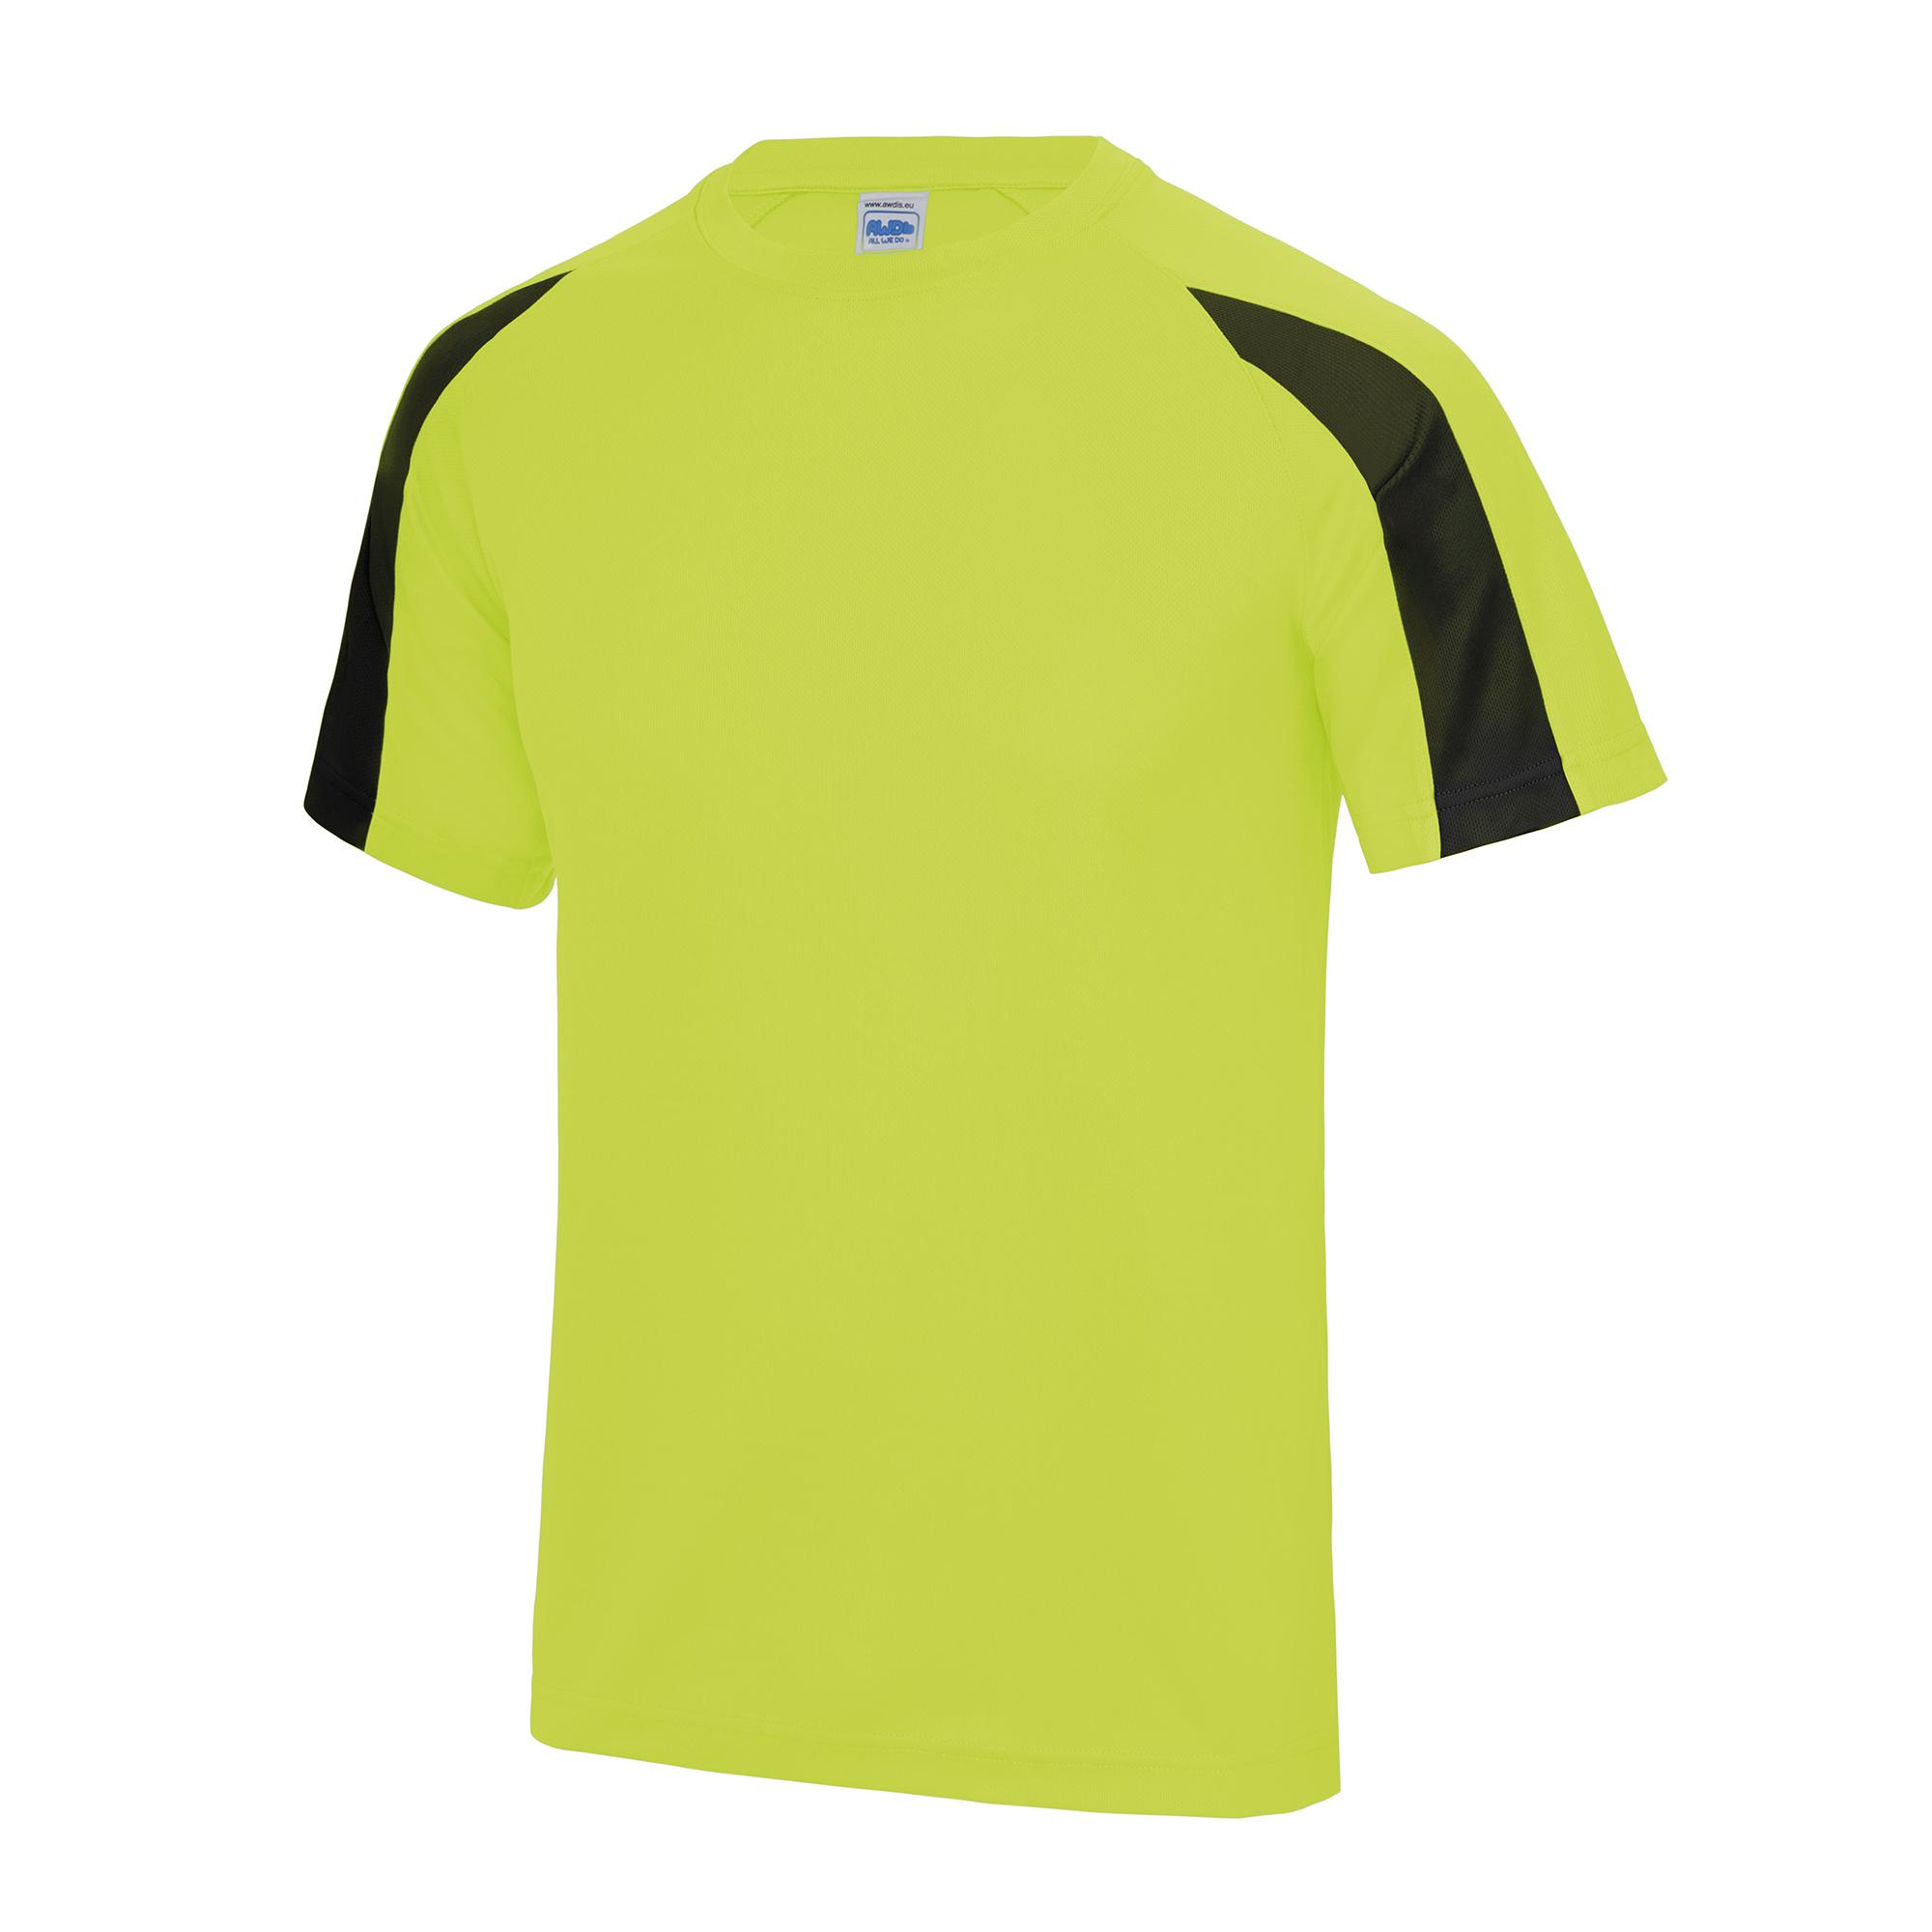 Just Cool Mens Contrast Cool Sports Plain T Shirt